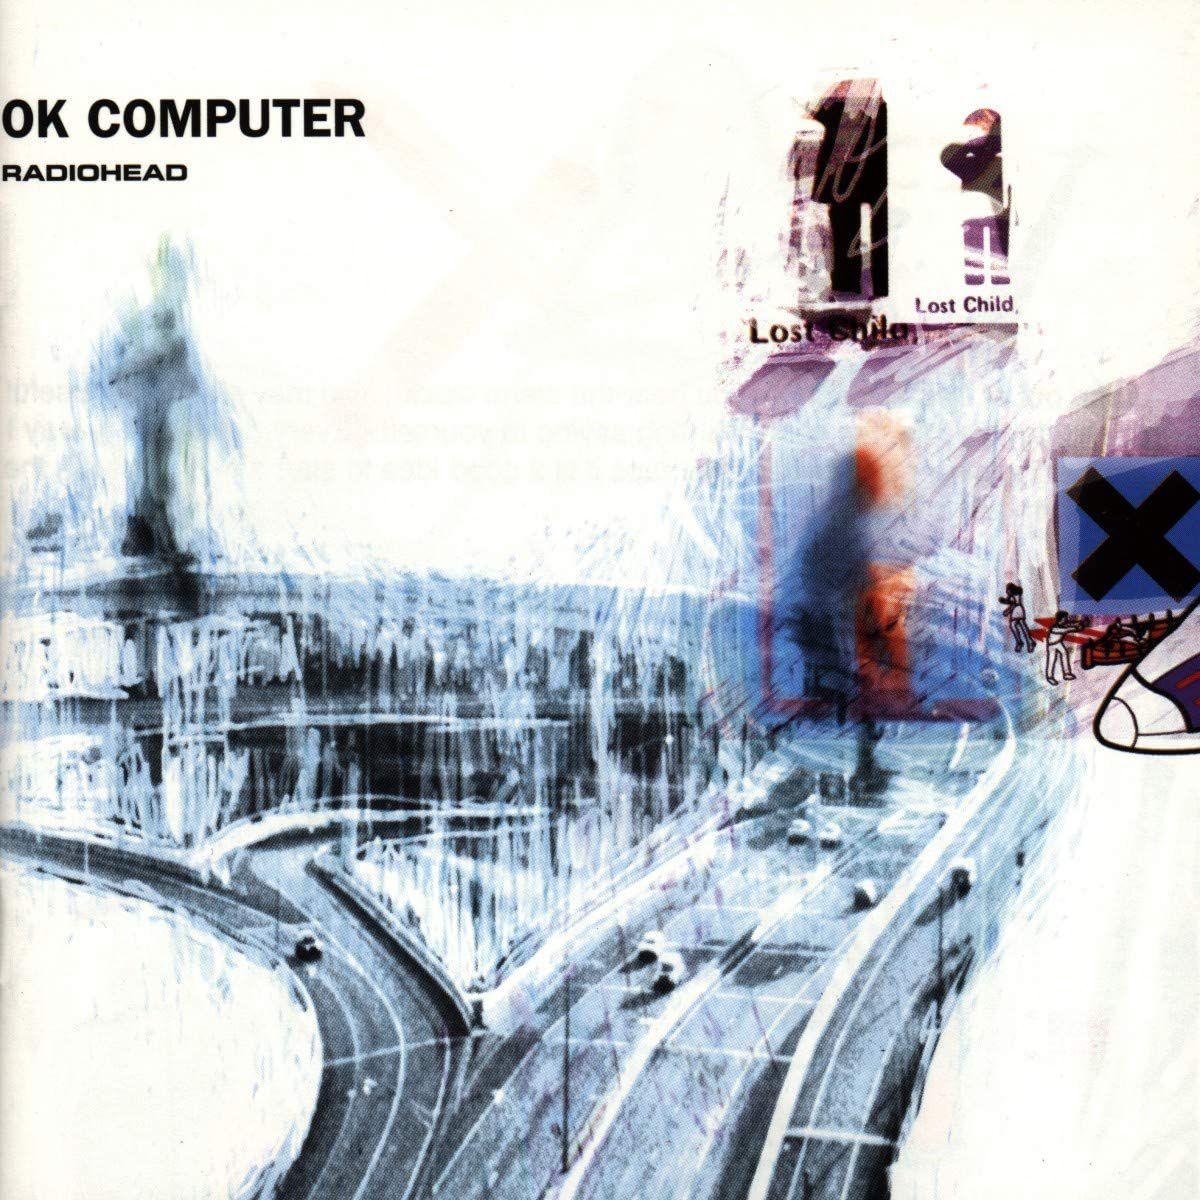 Ok Computer by Radiohead album cover